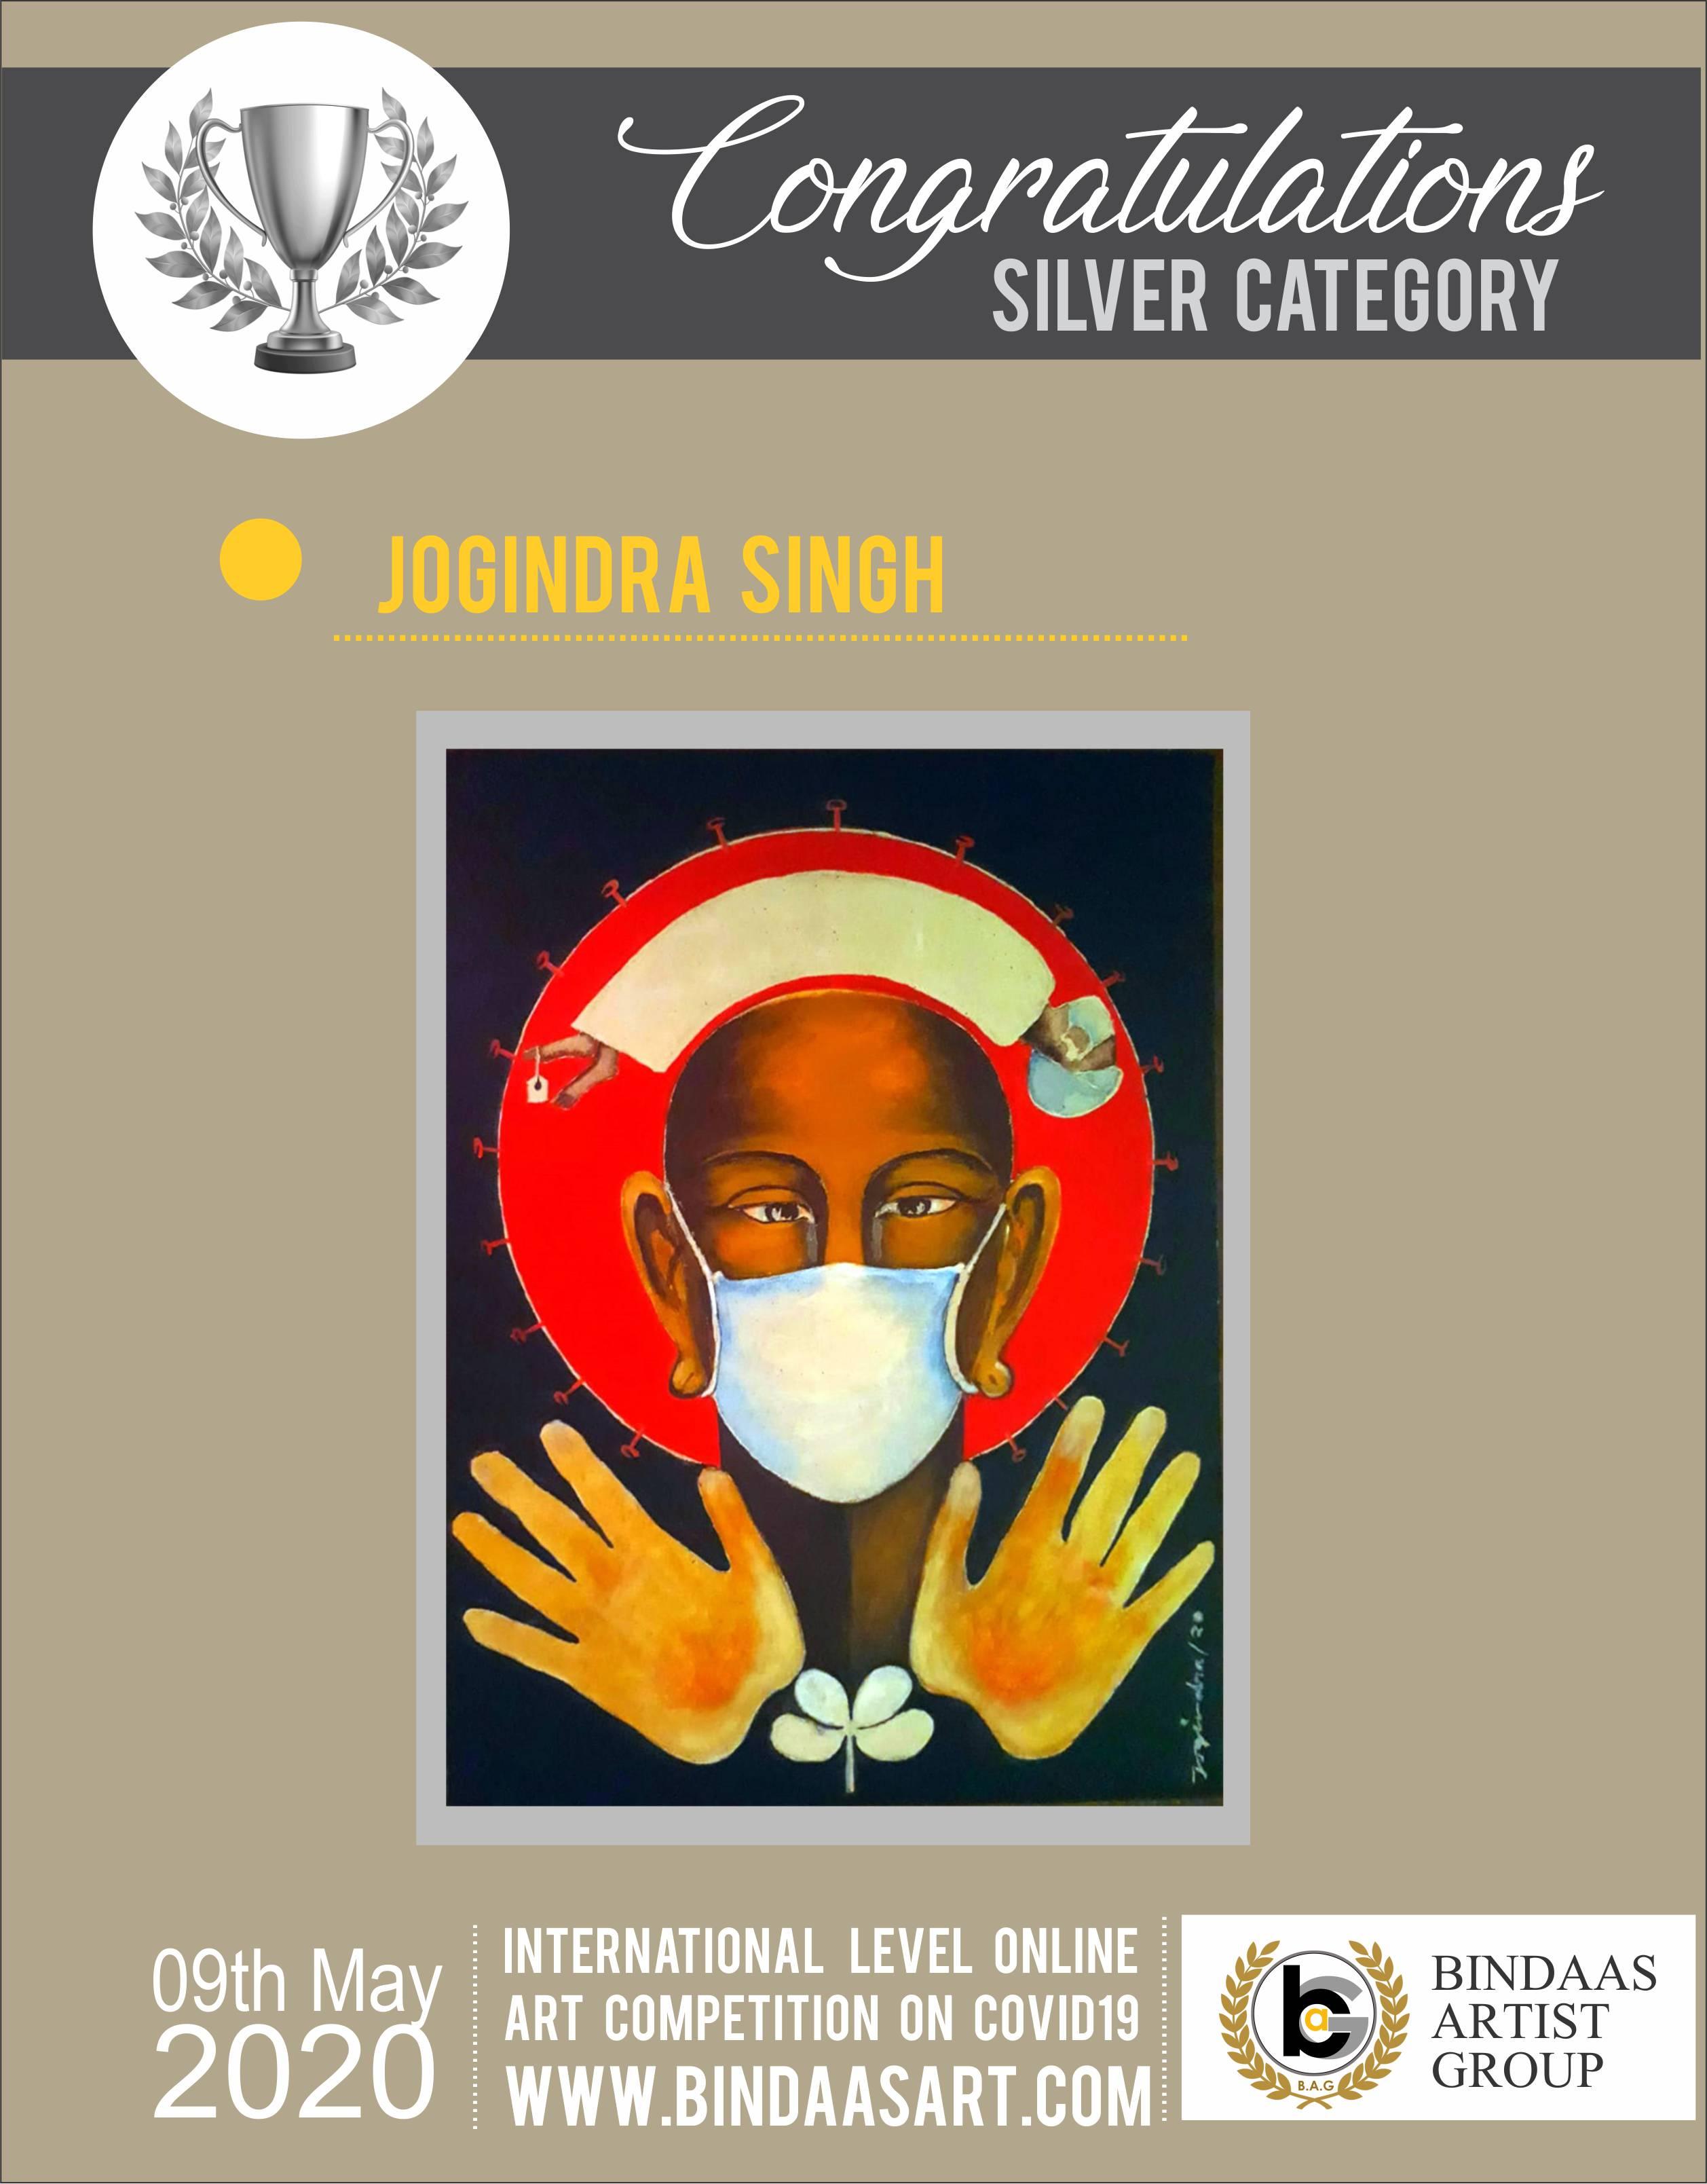 Jogindra Singh